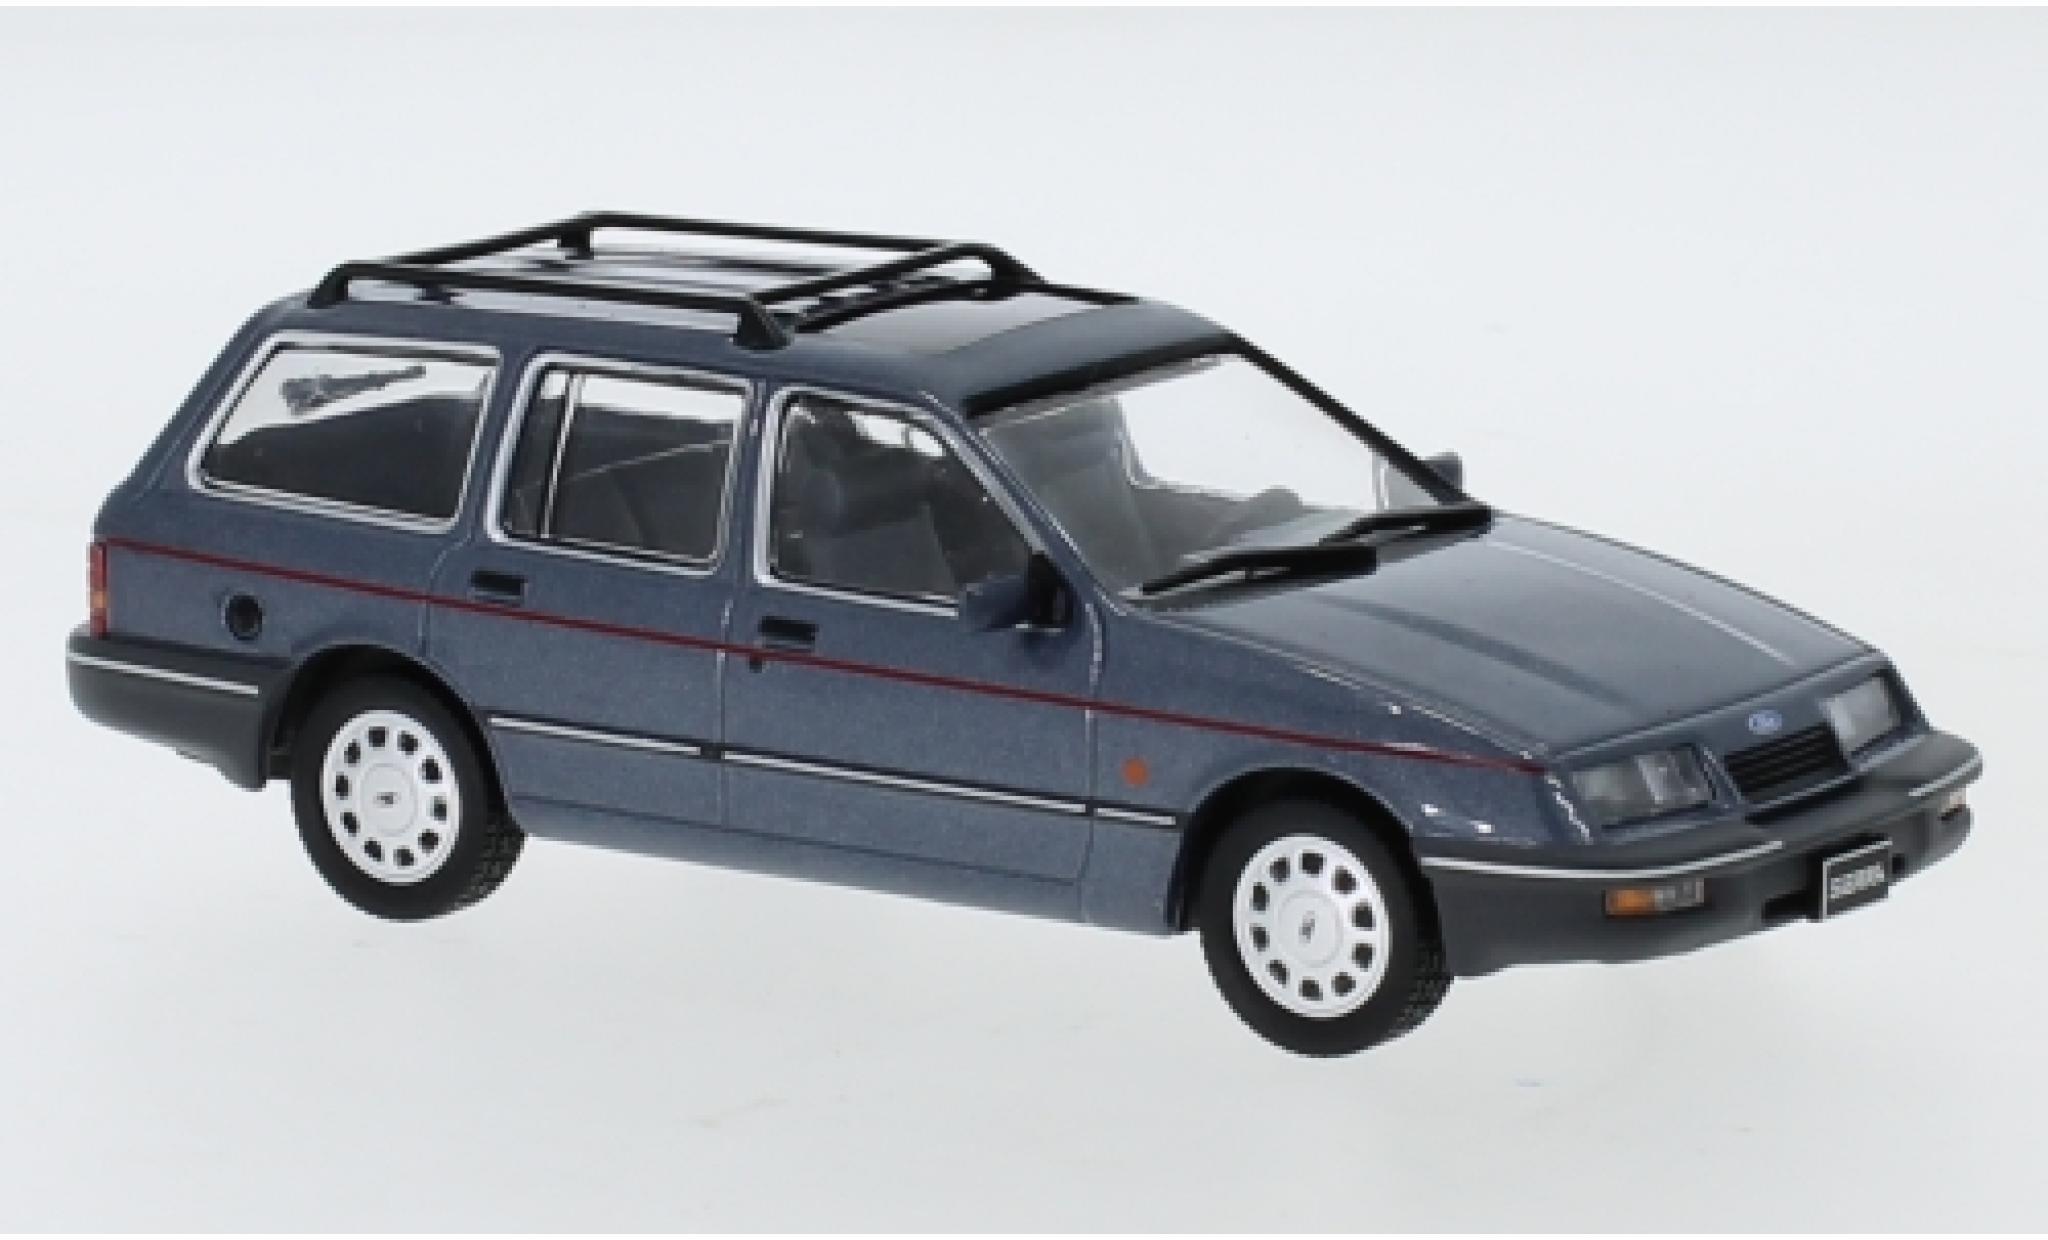 Ford Sierra 1/43 IXO Turnier Ghia metallise grise 1988